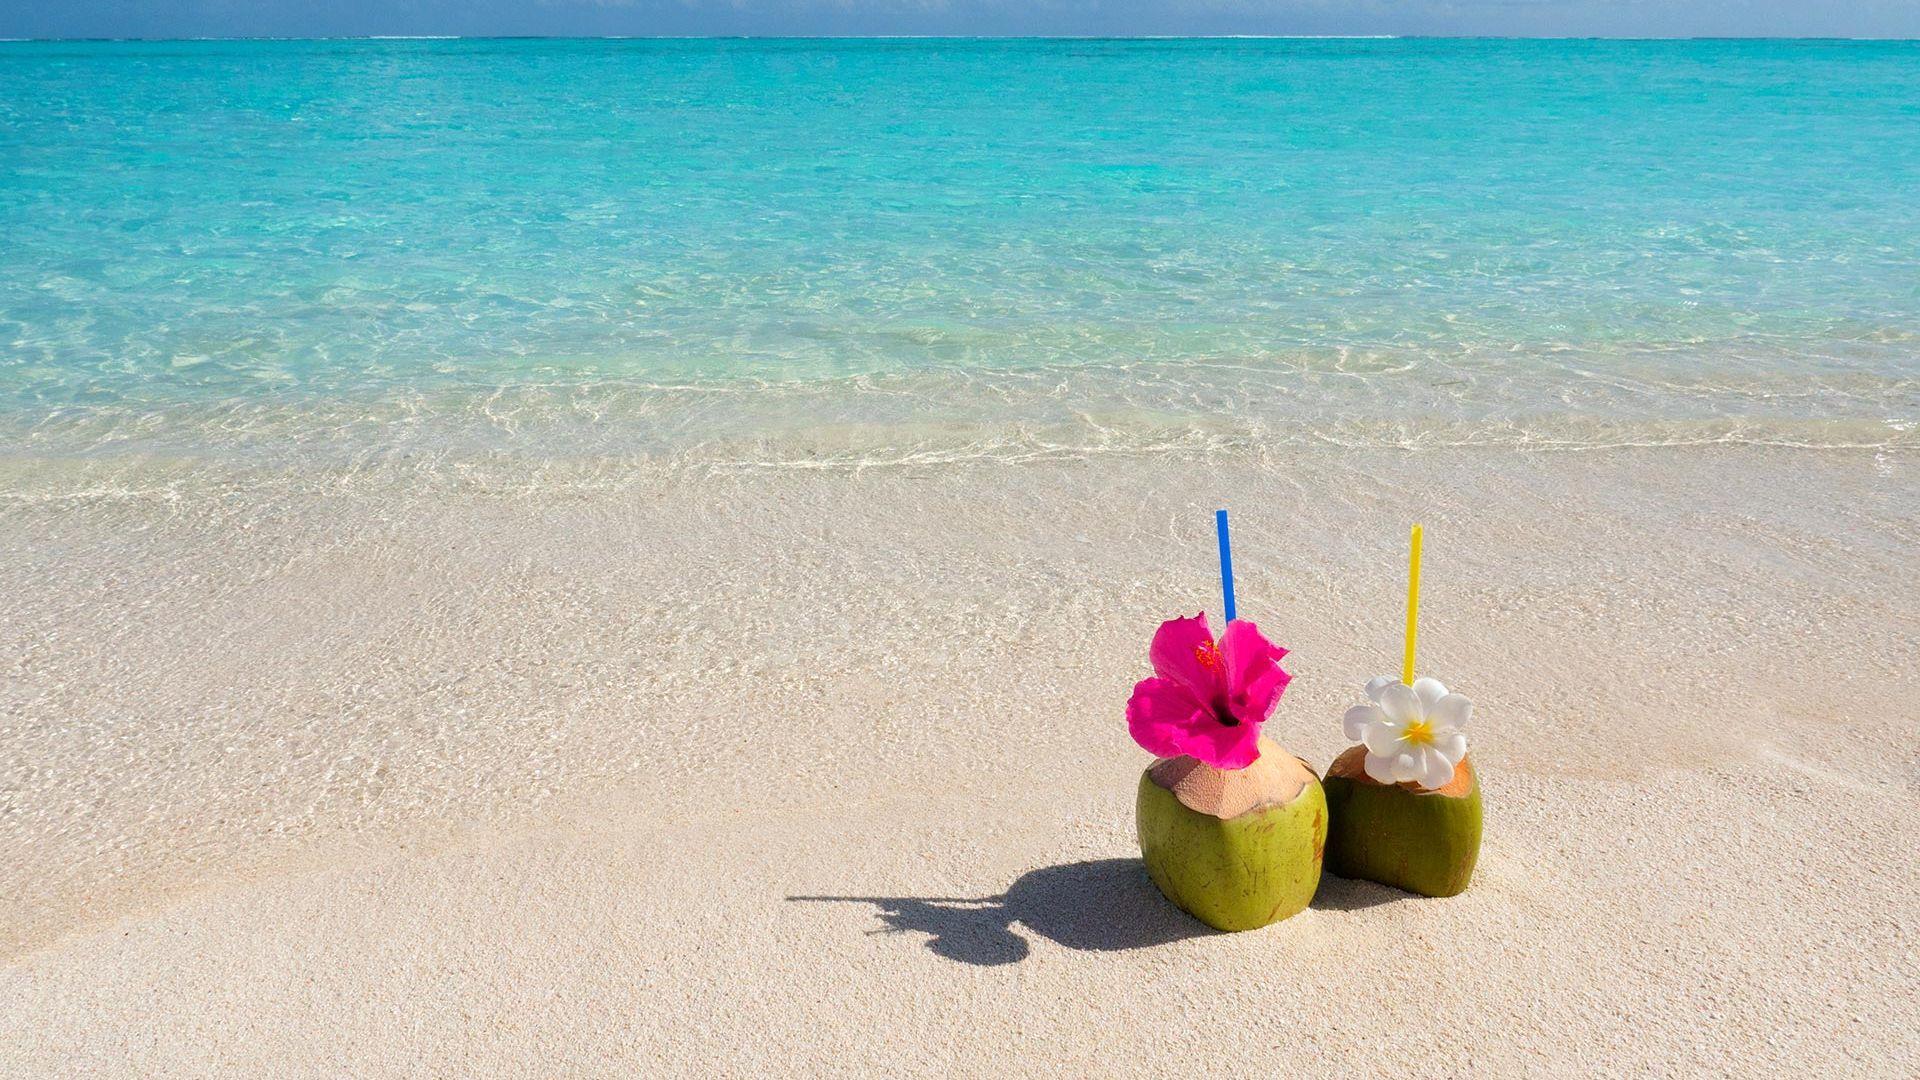 Sejur plaja Maldive, 12 zile - mai 2022